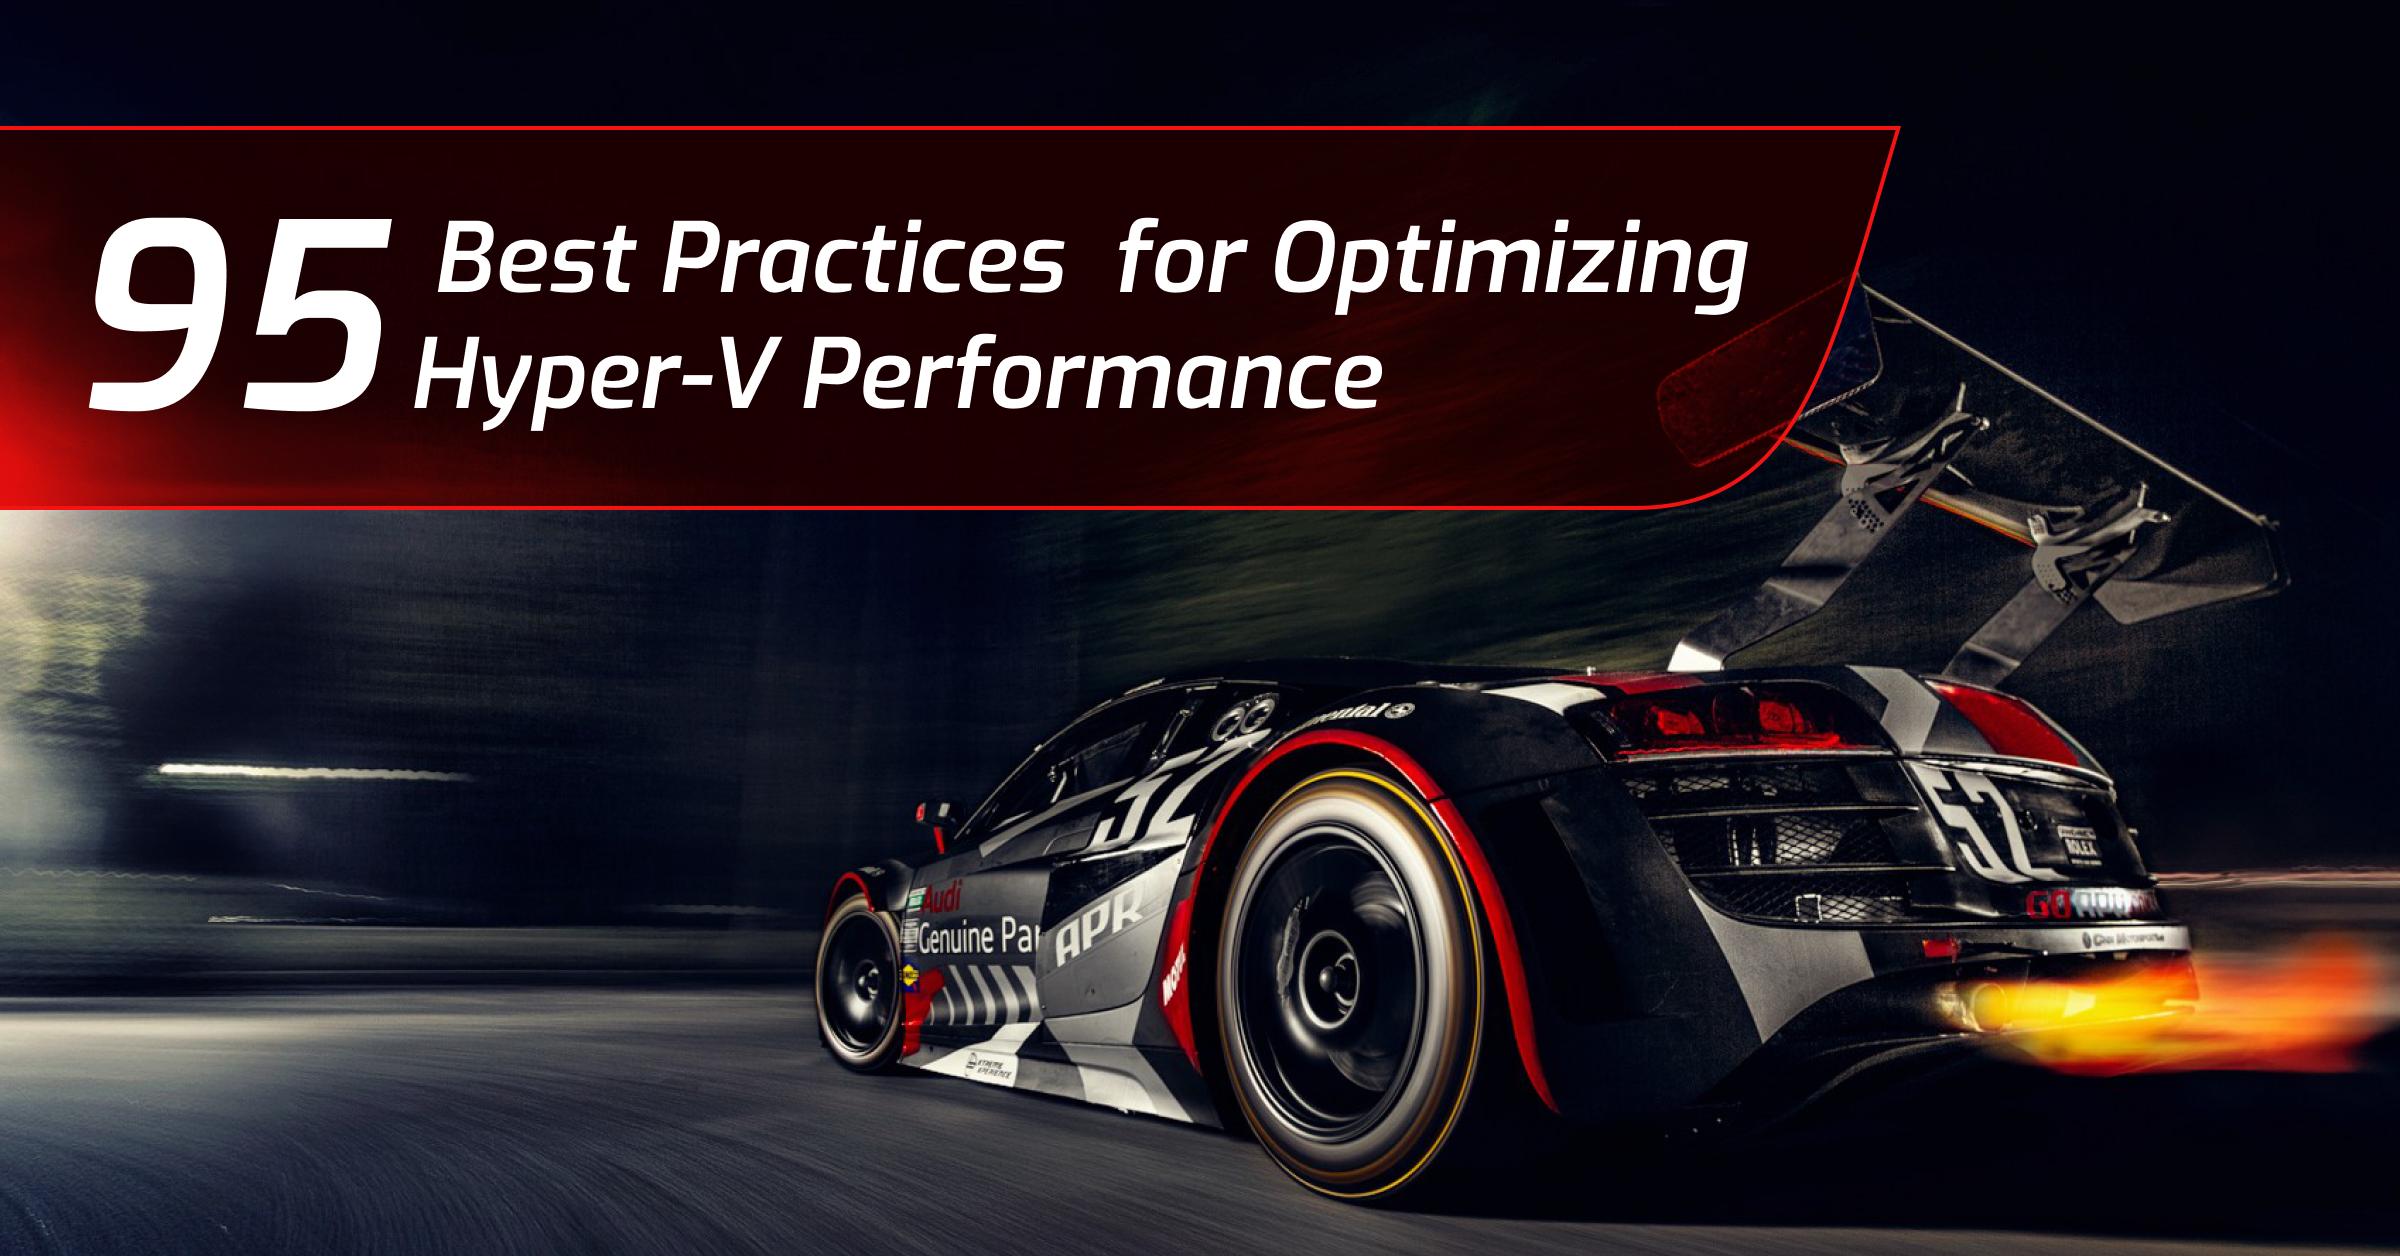 How to optimize Hyper-V Performance